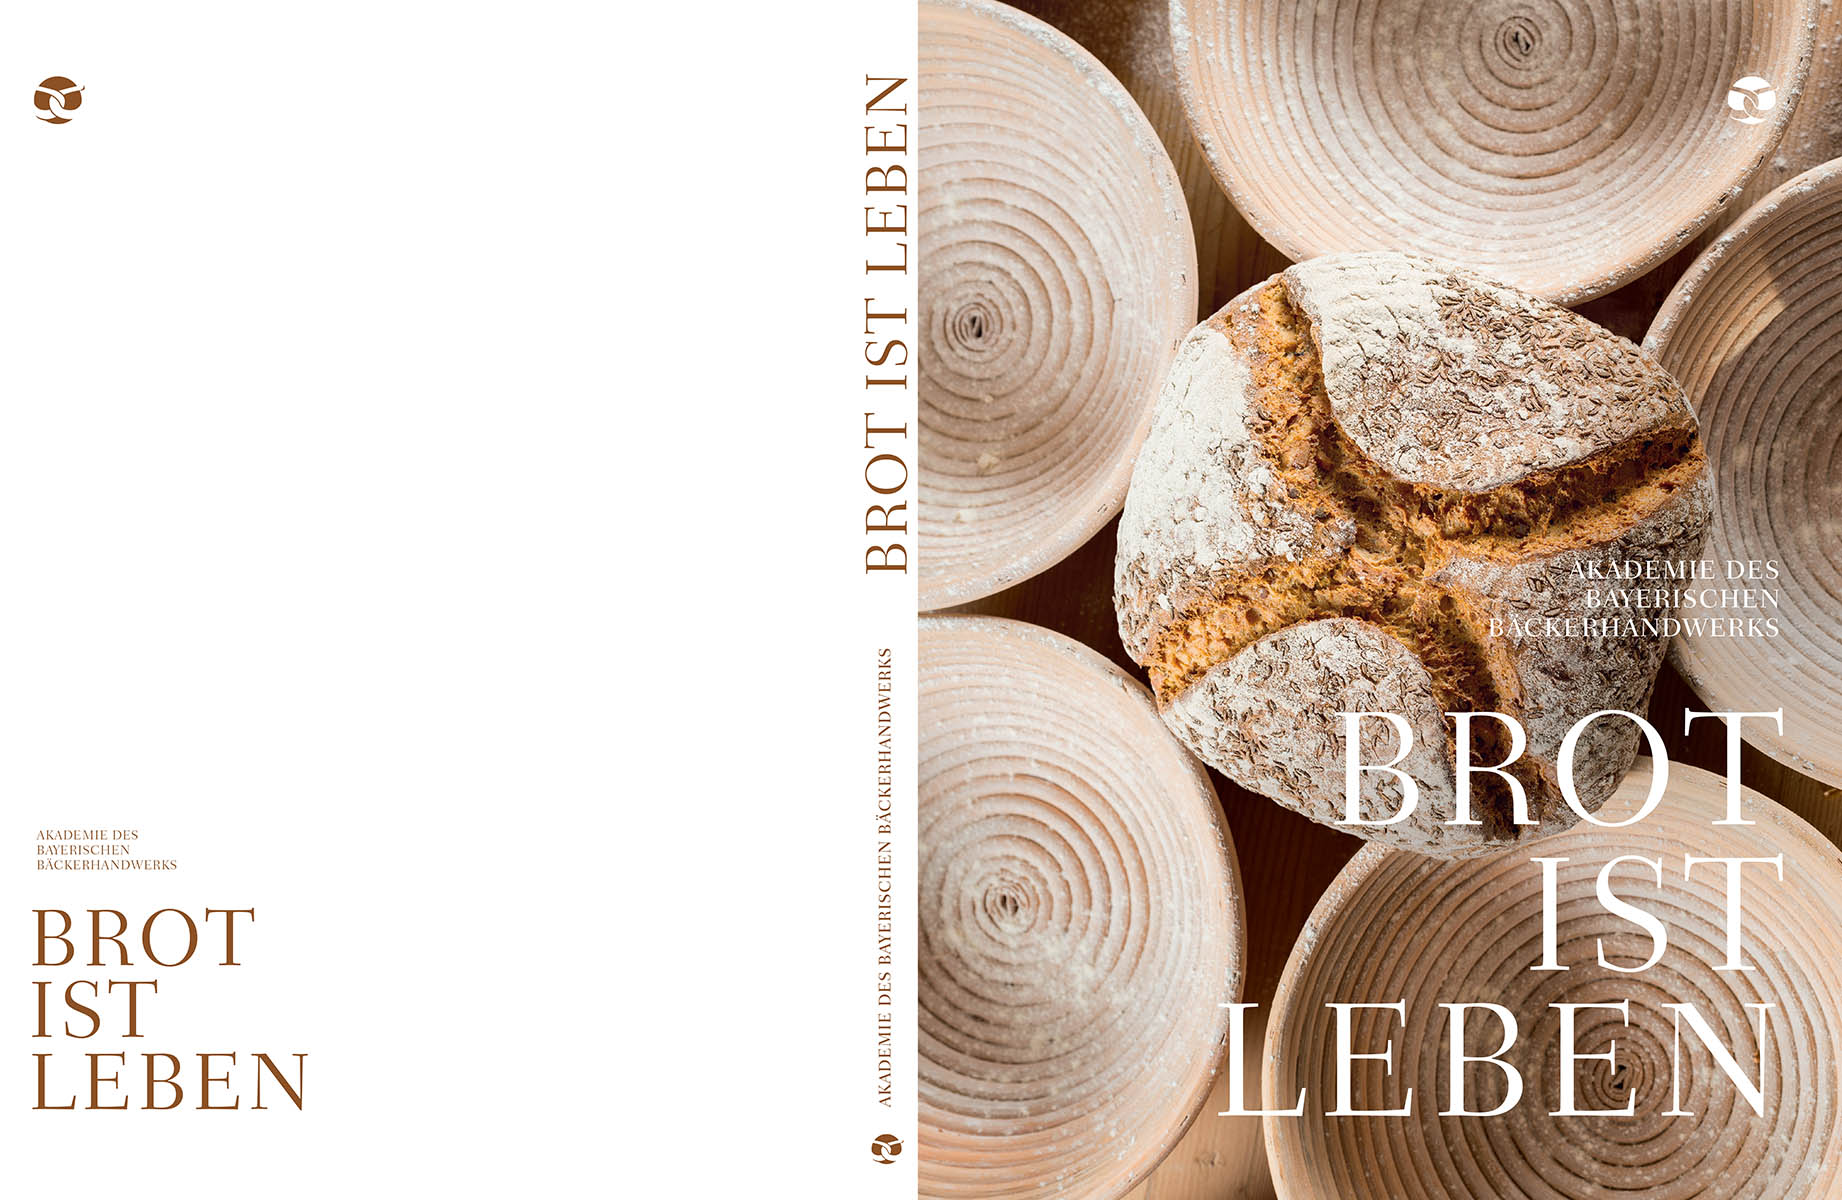 Brot ist Leben